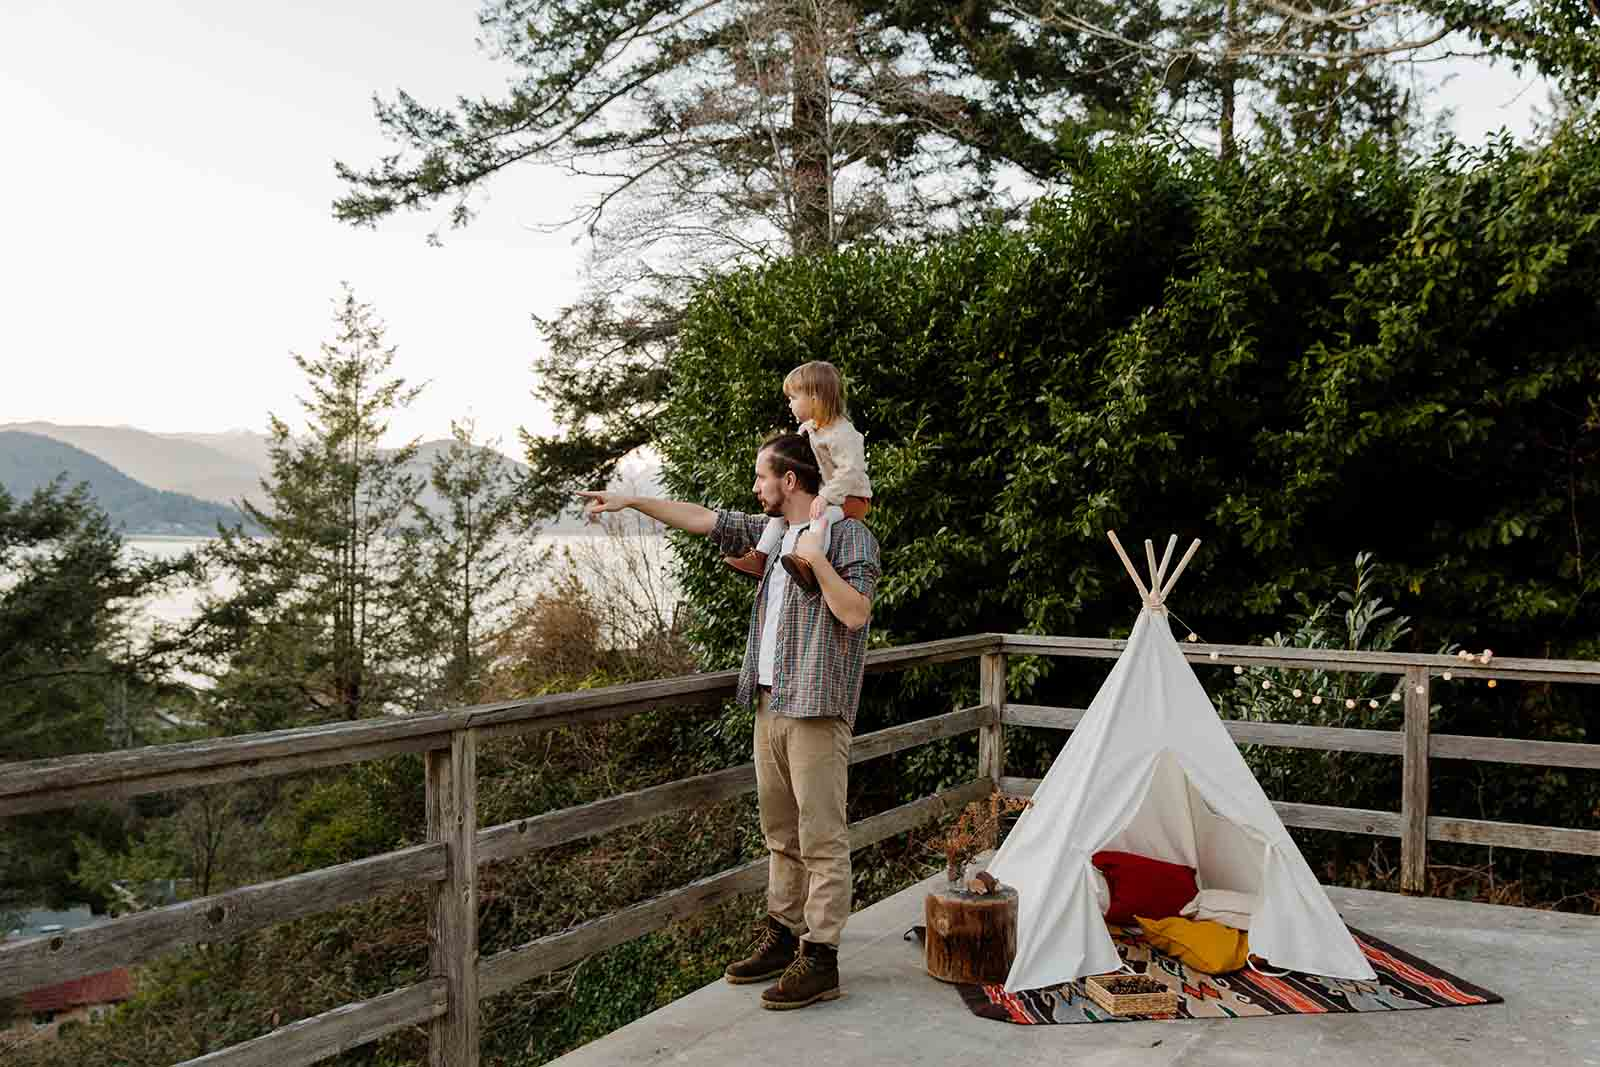 Vater Kind Kuren stärken die Vater Kind Beziehung